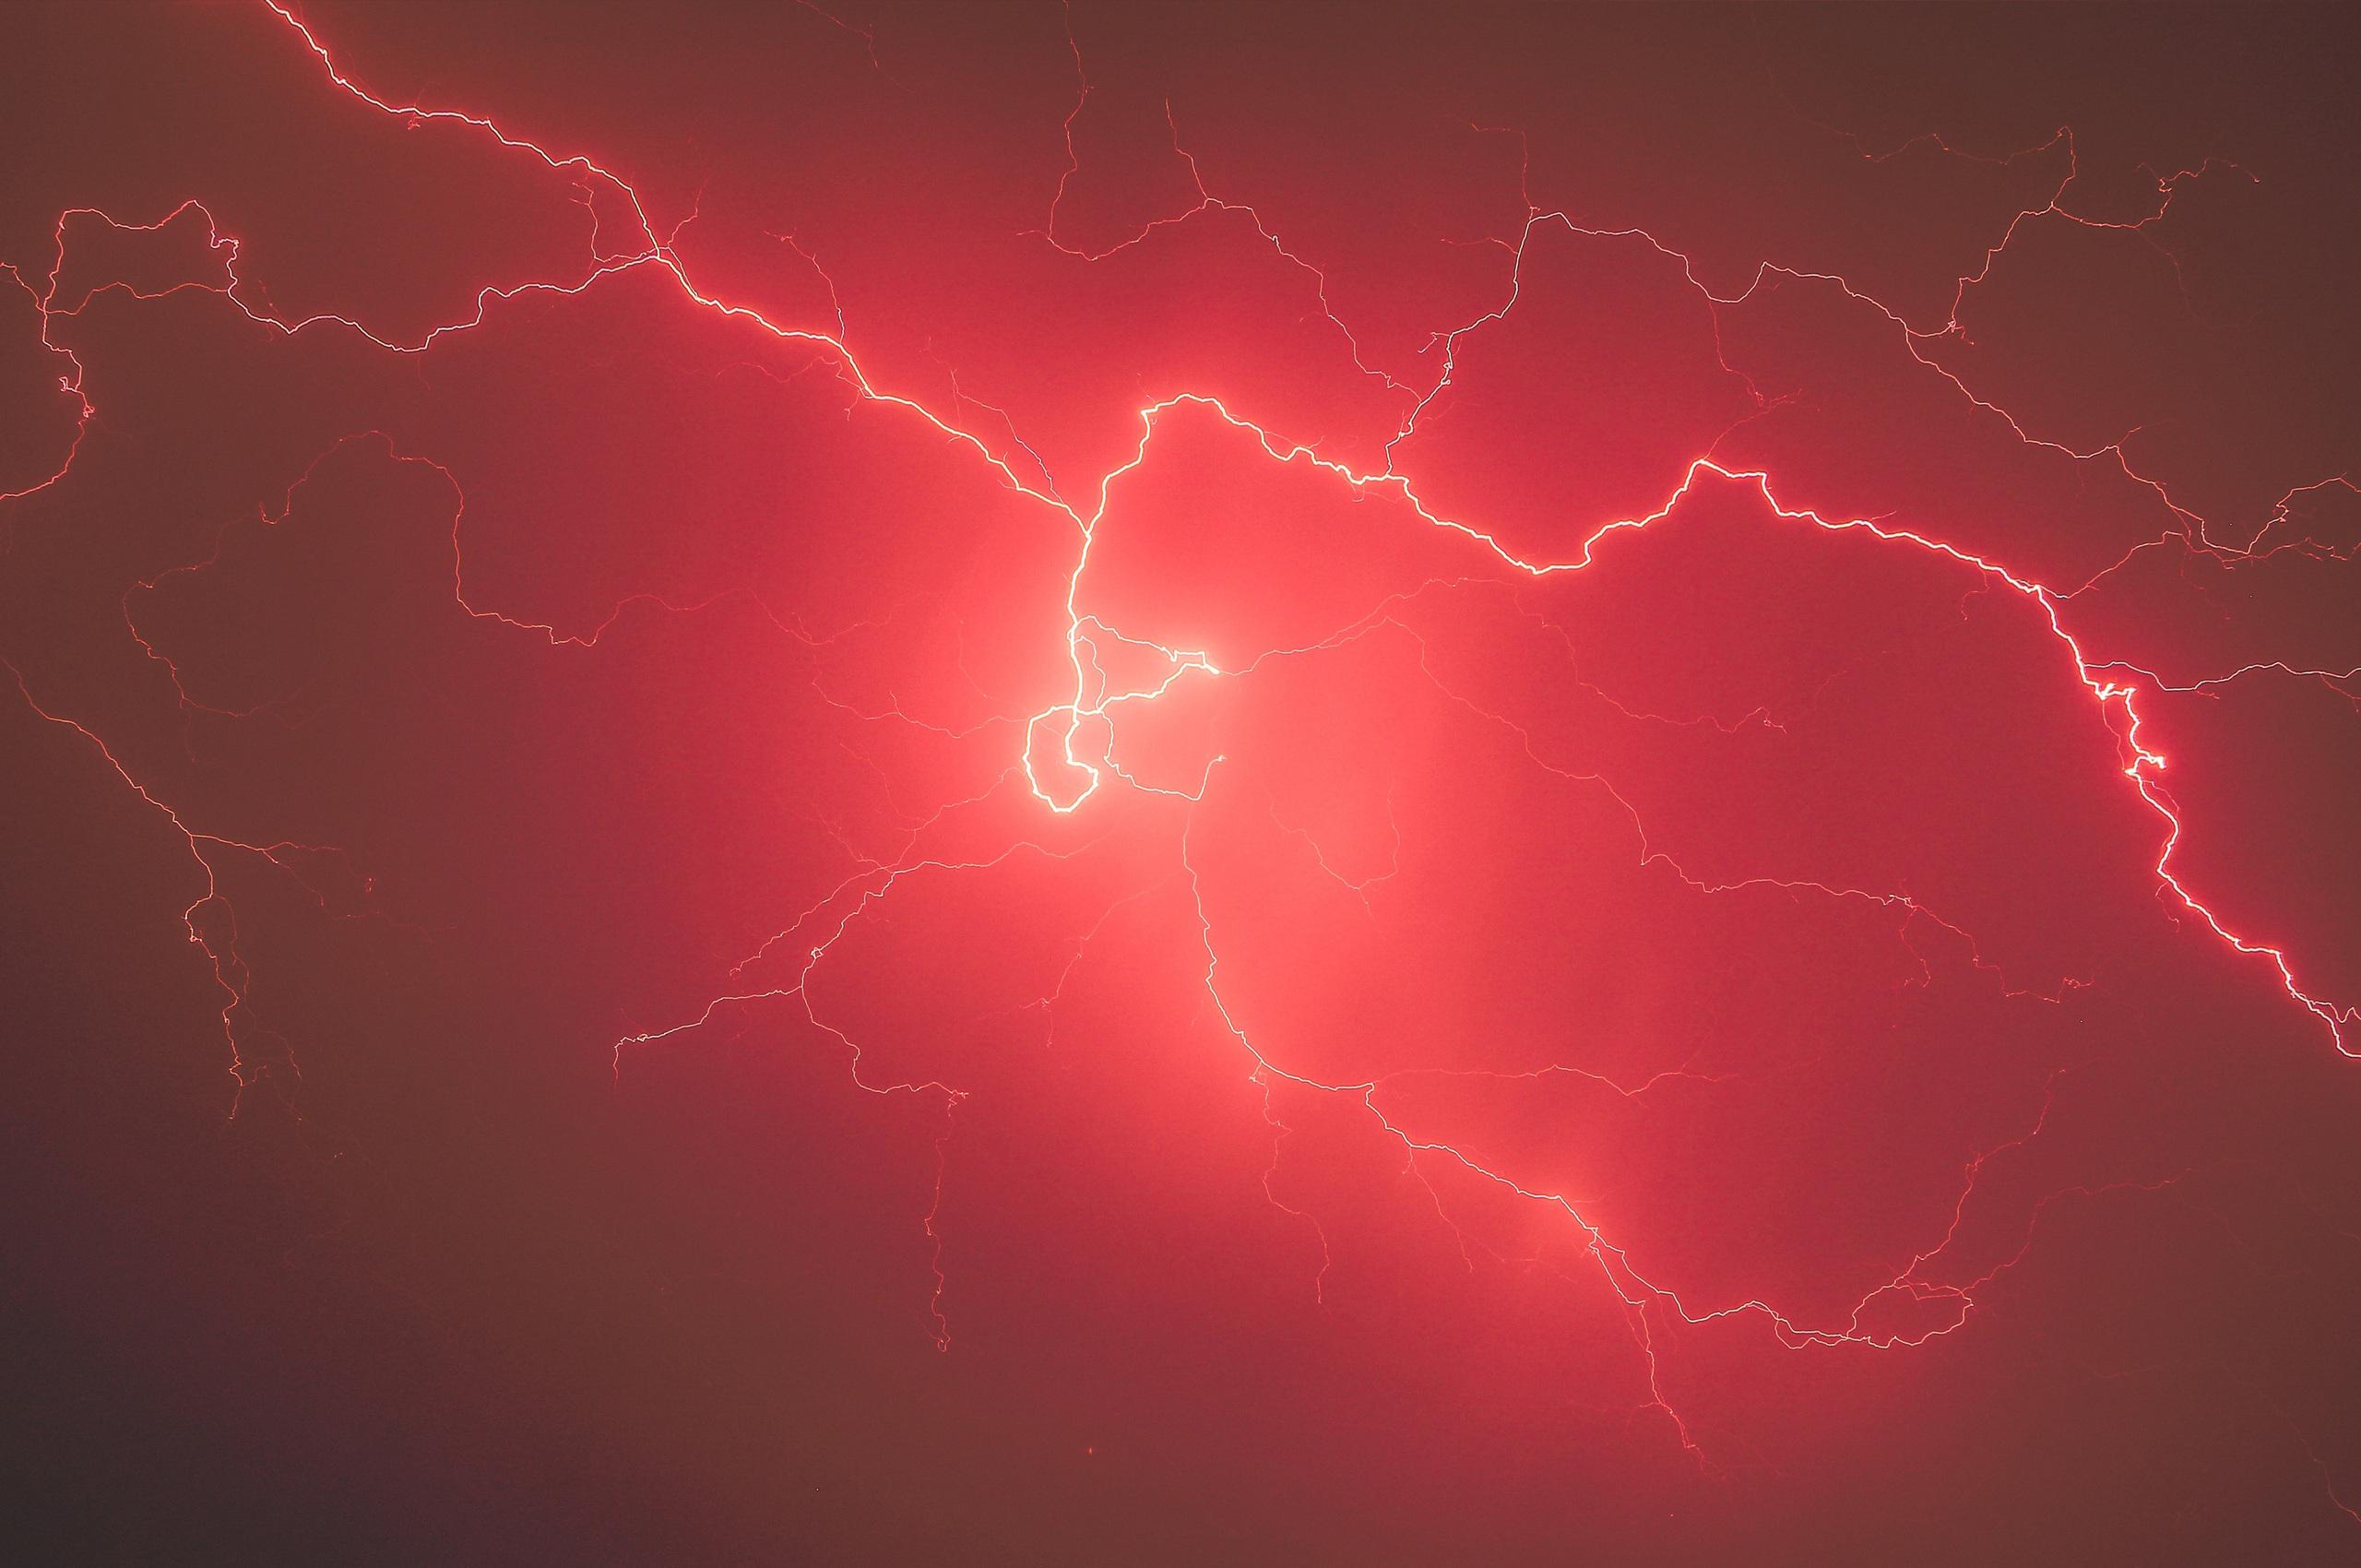 2560x1700 lightning storm red sky 5k chromebook pixel hd 4k